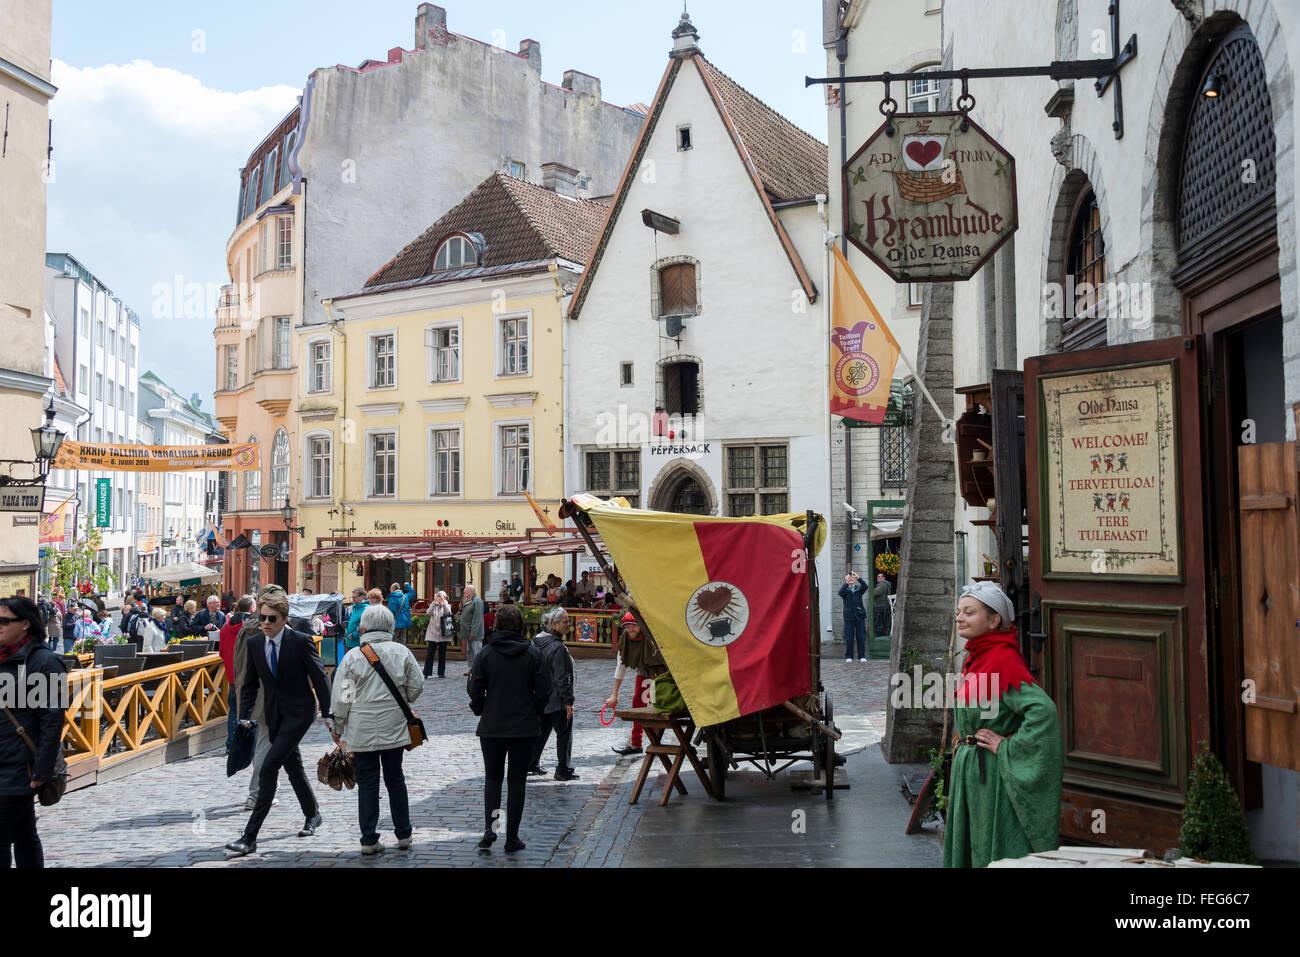 Olde Hansa Medieval Restaurant, Old Town, Tallinn, Harju County, Republic of Estonia - Stock Image